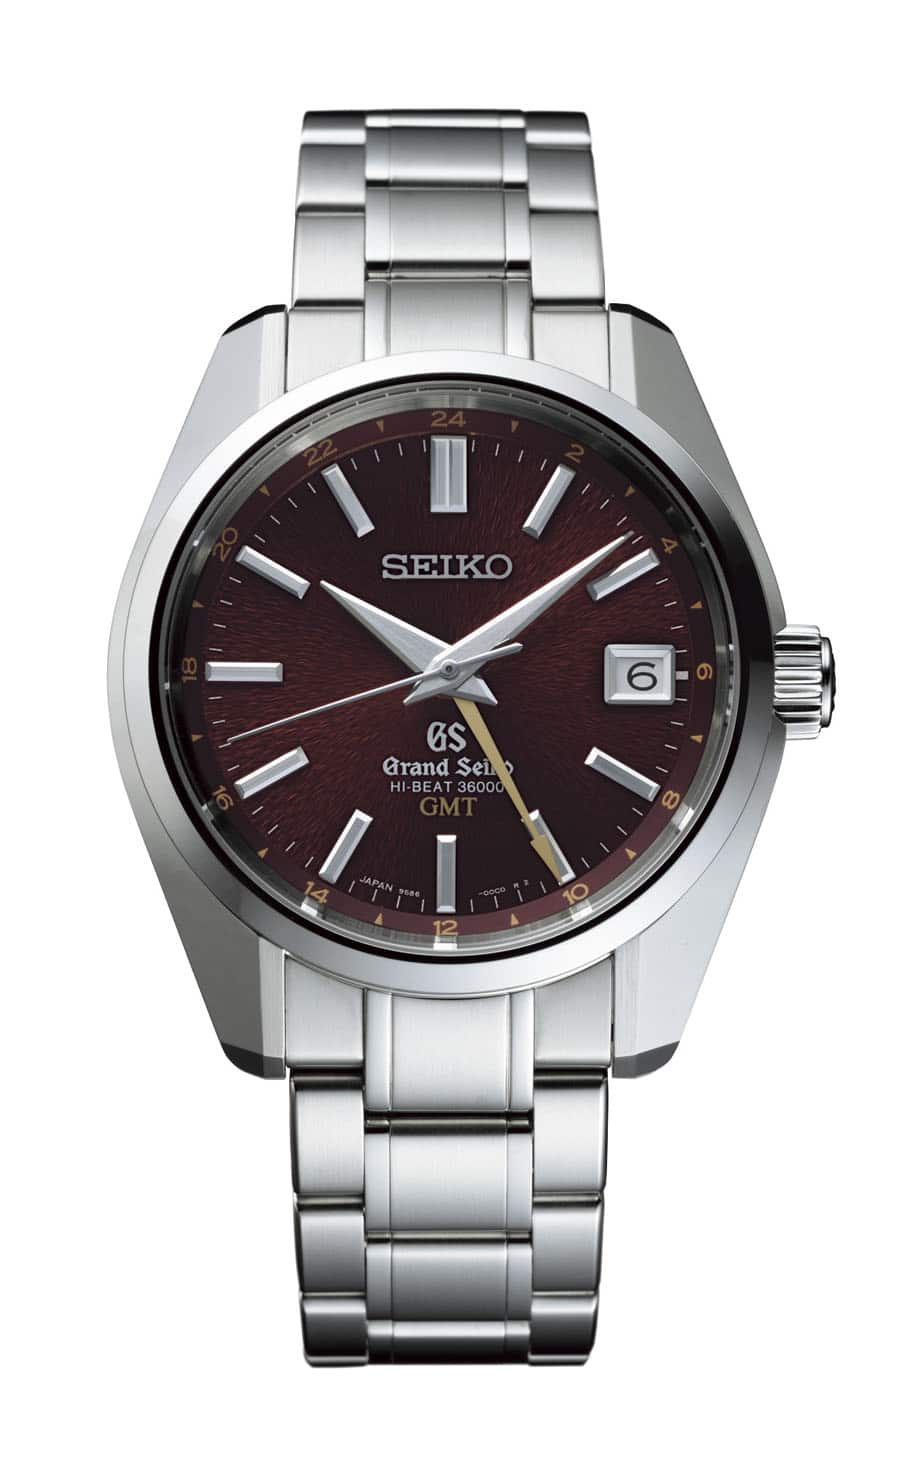 Seiko-Hi-Beat-36000-GMT-Limited-Edition-SBGJ021-1